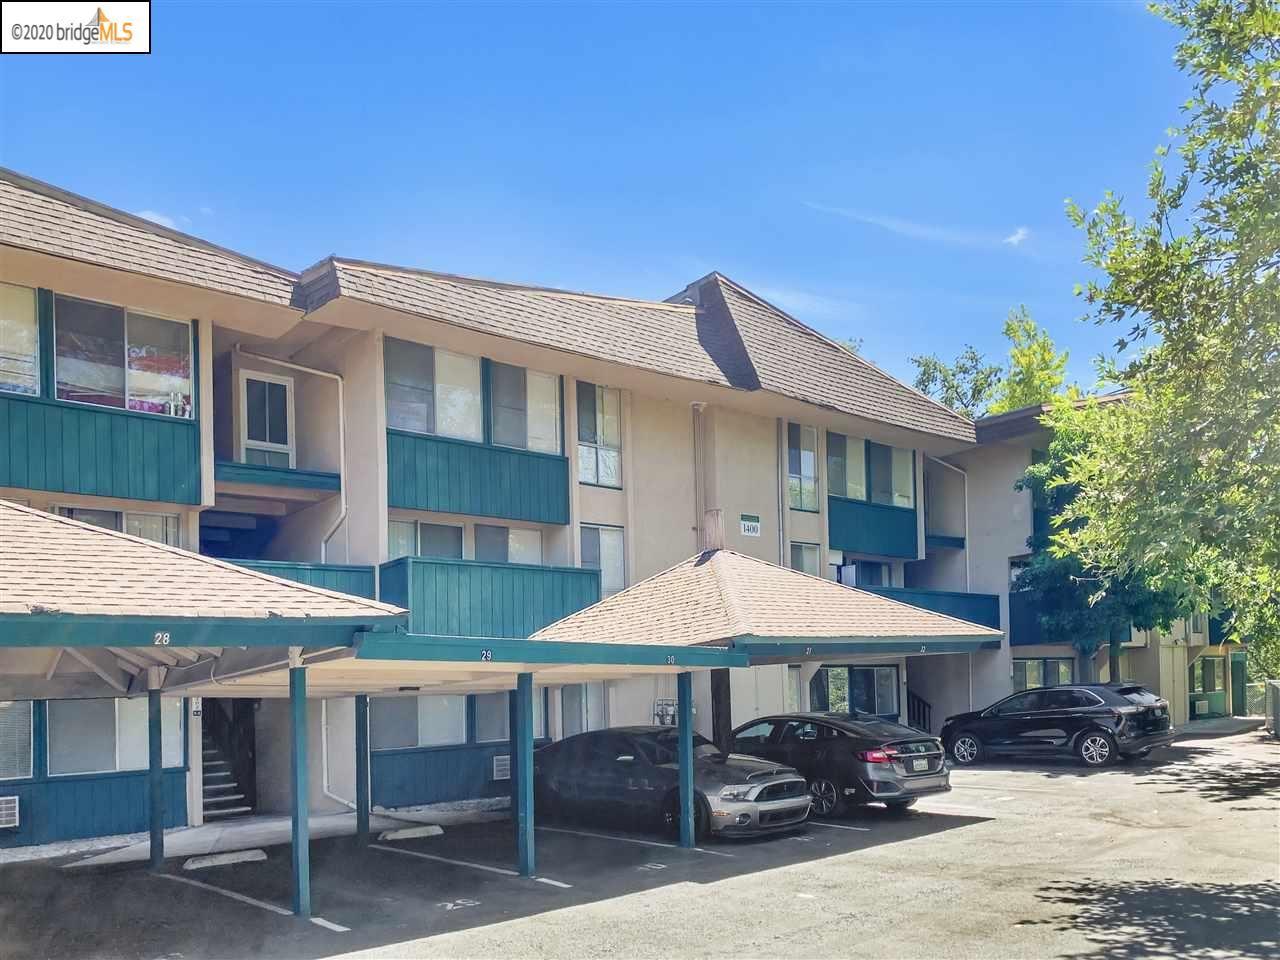 Photo of 1400 Creekside Dr, WALNUT CREEK, CA 94596 (MLS # 40920218)